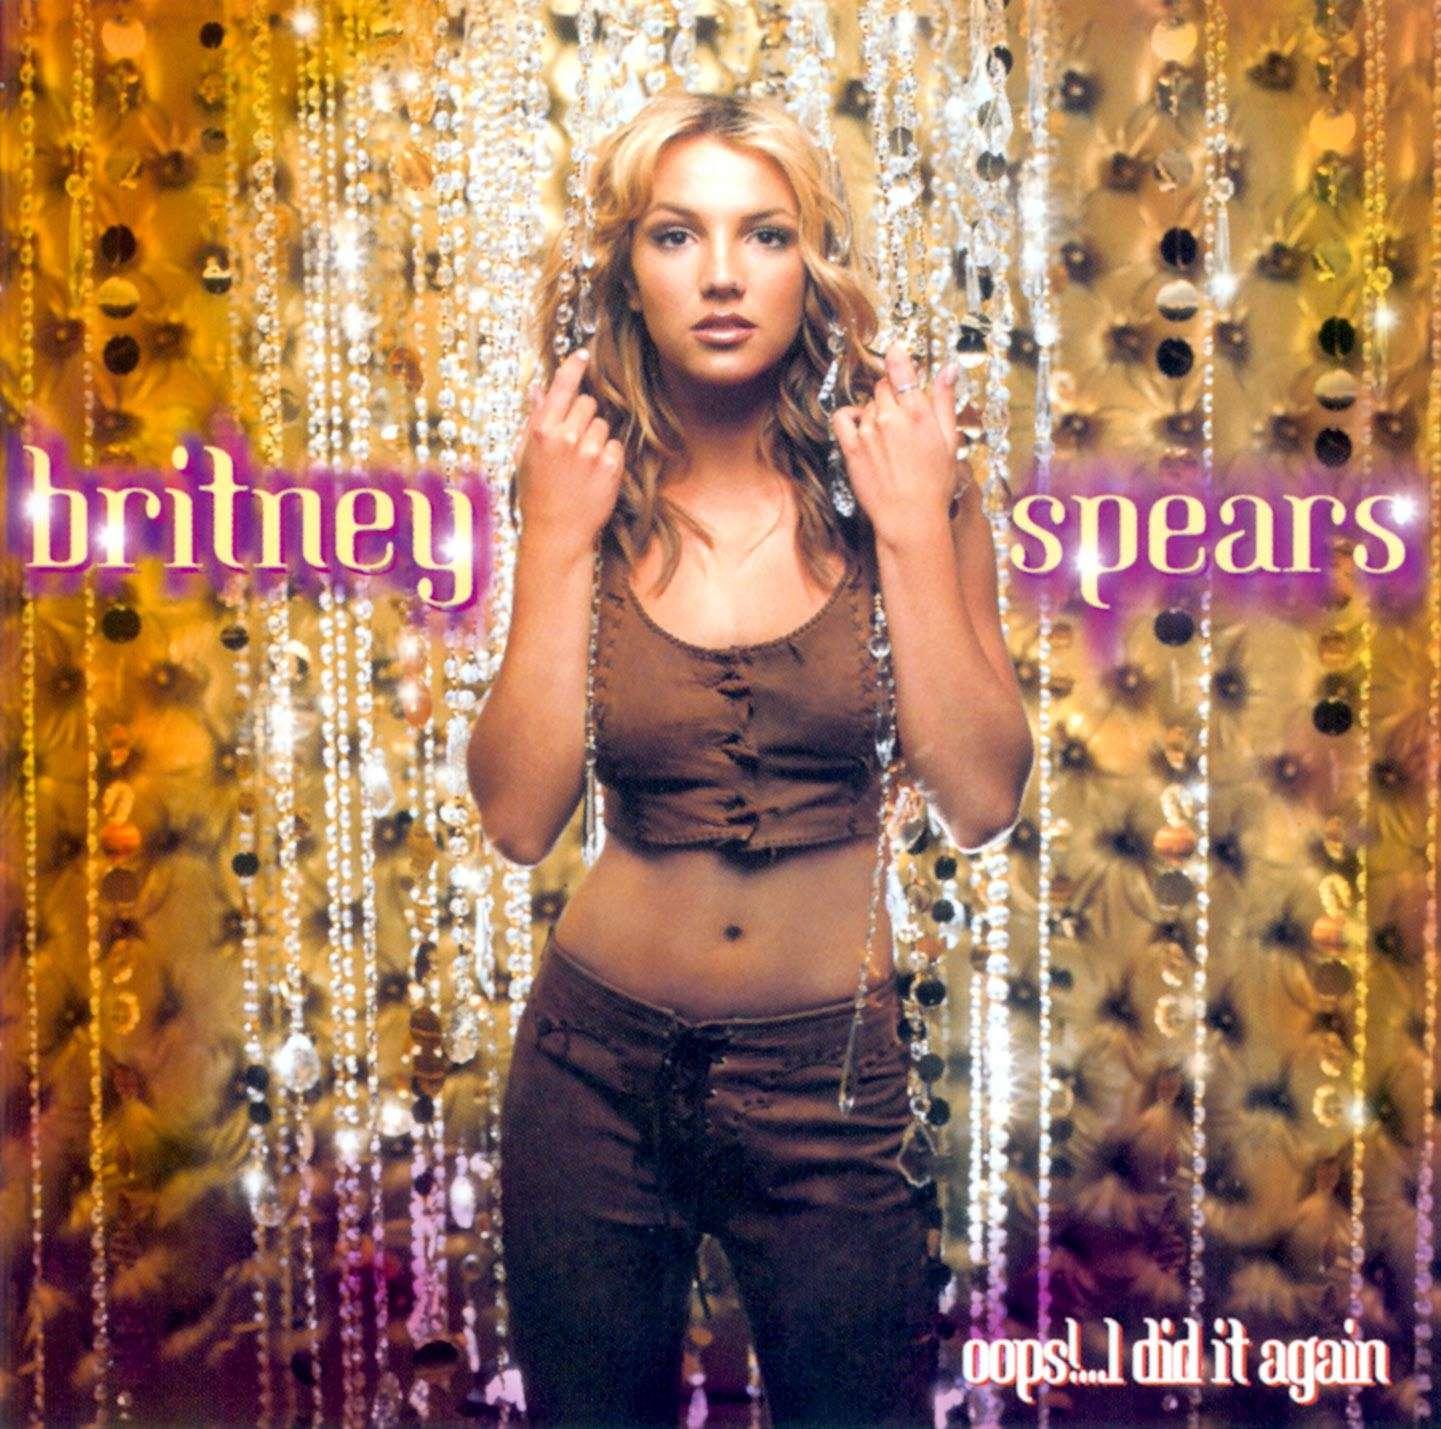 http://2.bp.blogspot.com/-AbAOQcYXQbM/TxtSFiMvtoI/AAAAAAAADXU/BZHigs2GUws/s1600/Britney-Spears-Oops-I-Did-It-Again-Delantera.jpg